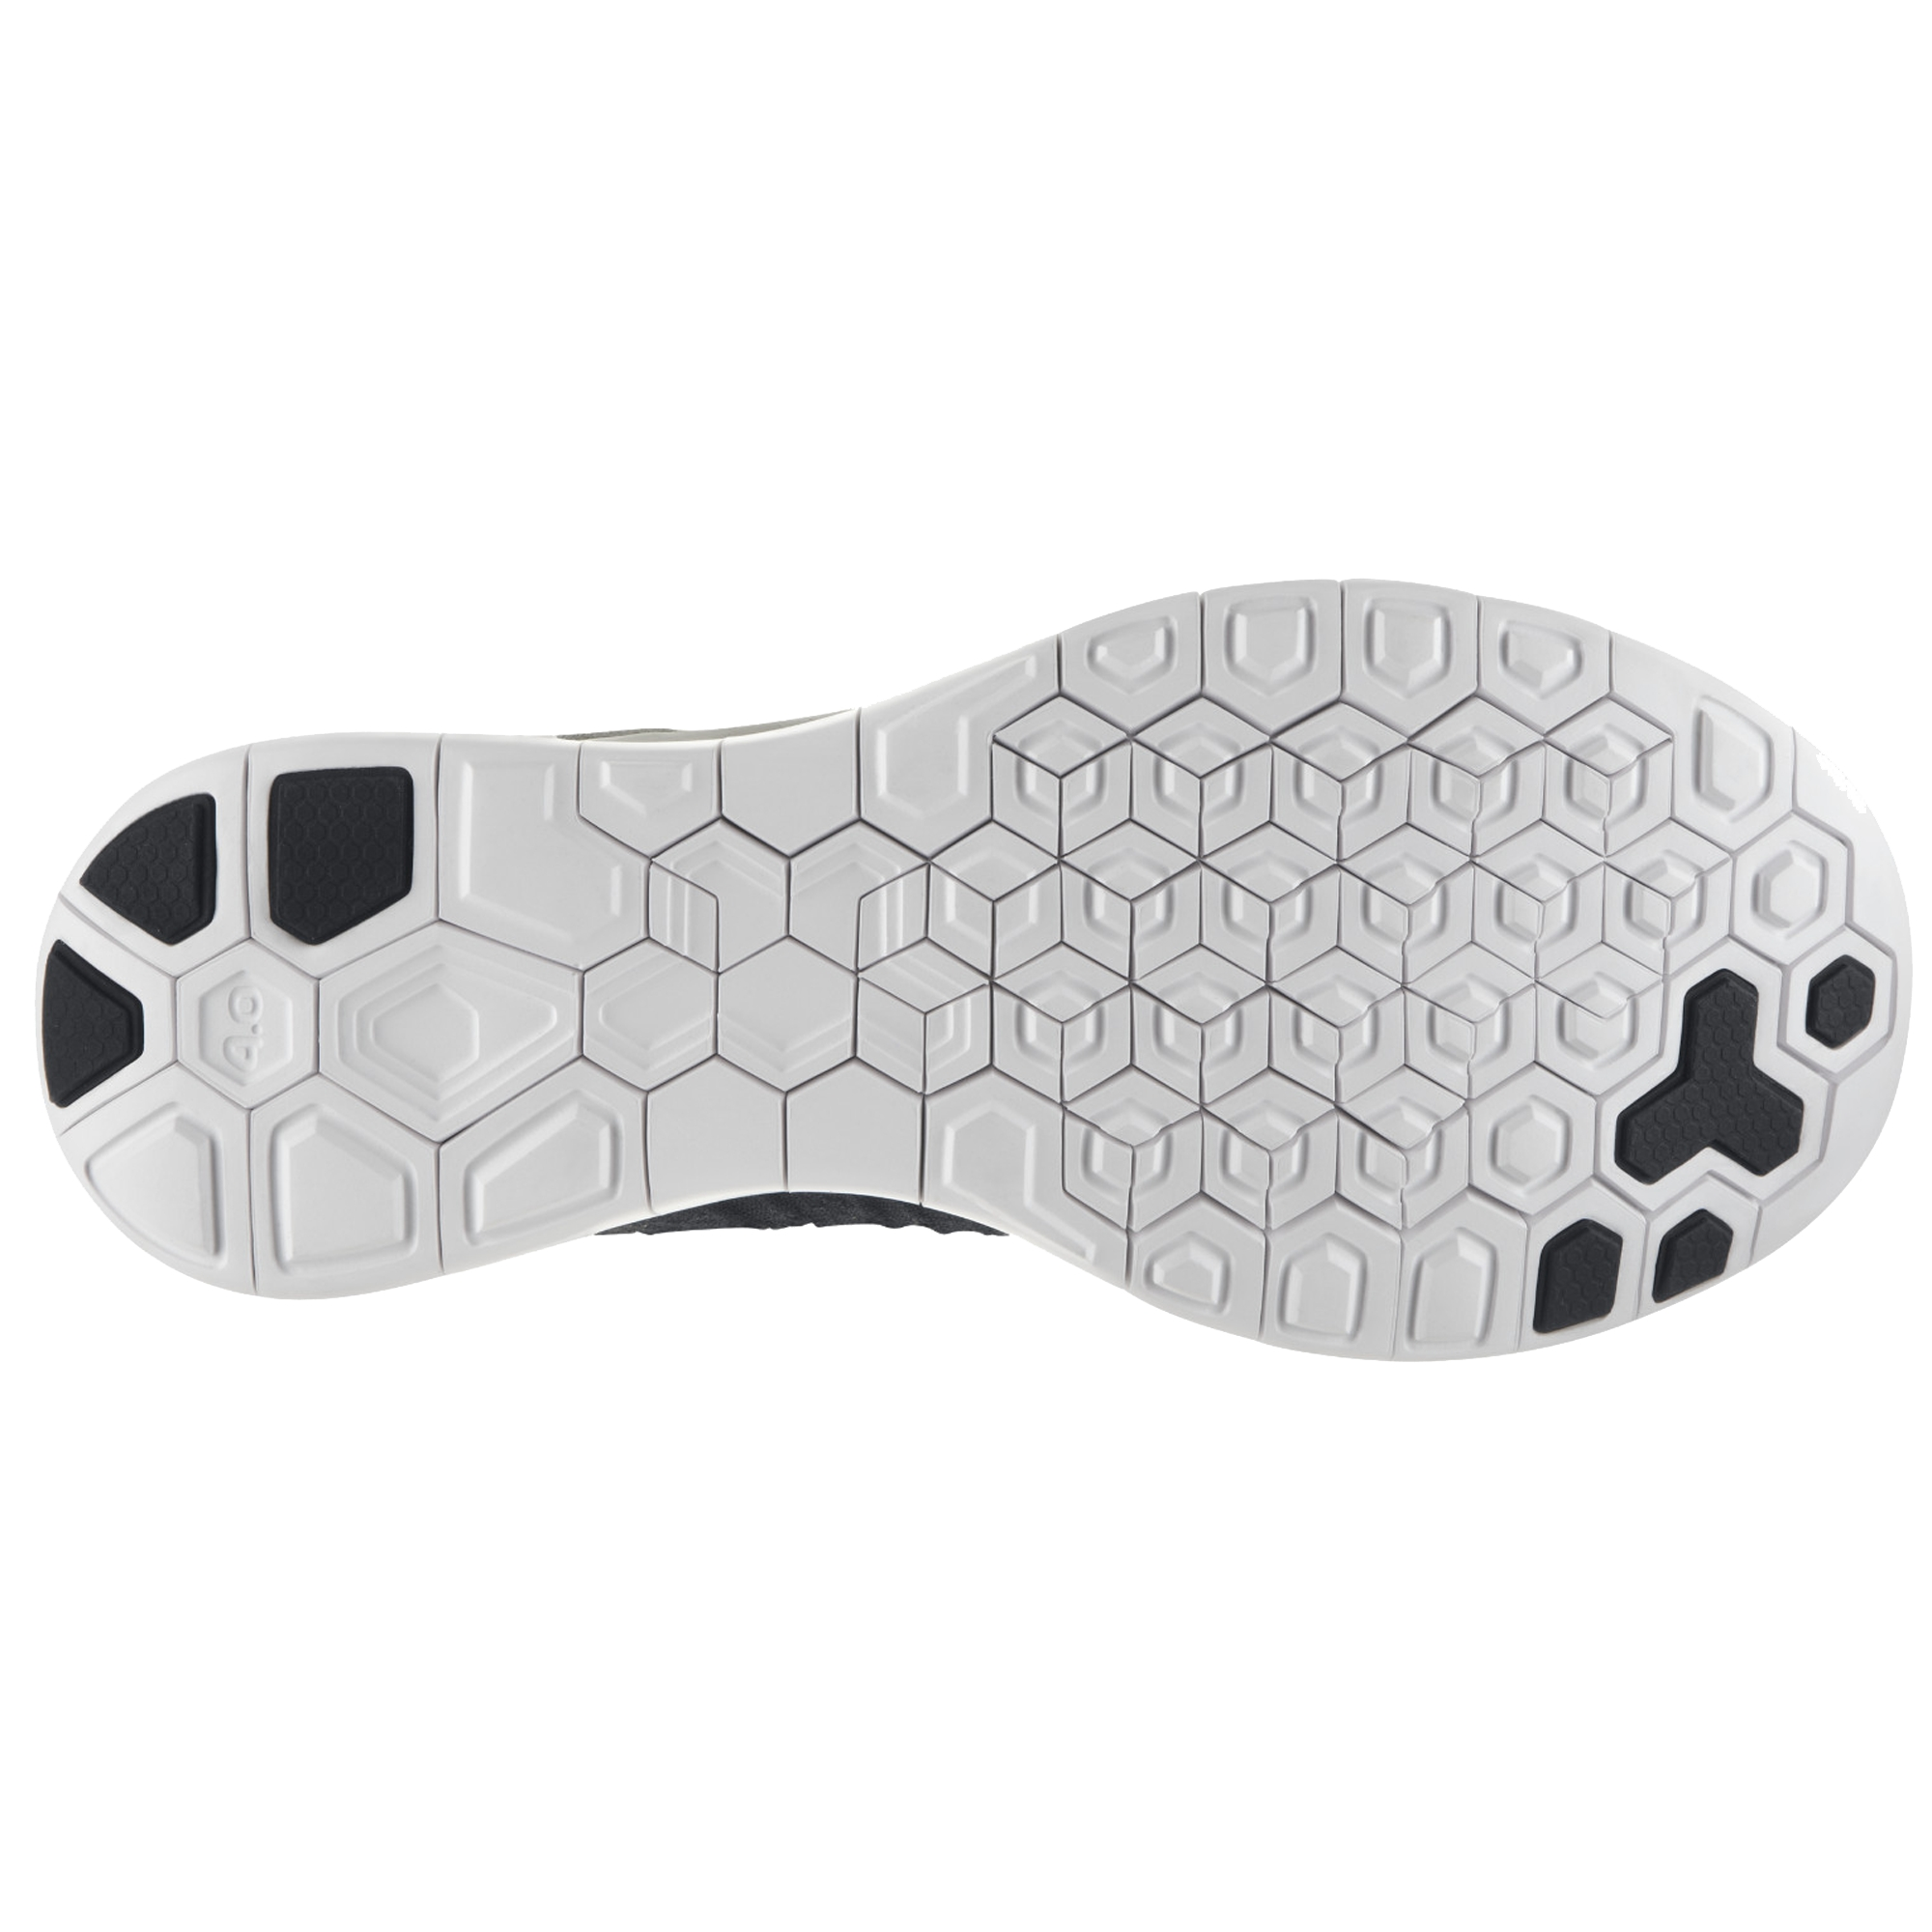 ddc1216e9cc4 ... Nike Free 4.0 Flyknit Erkek Spor Ayakkabı .